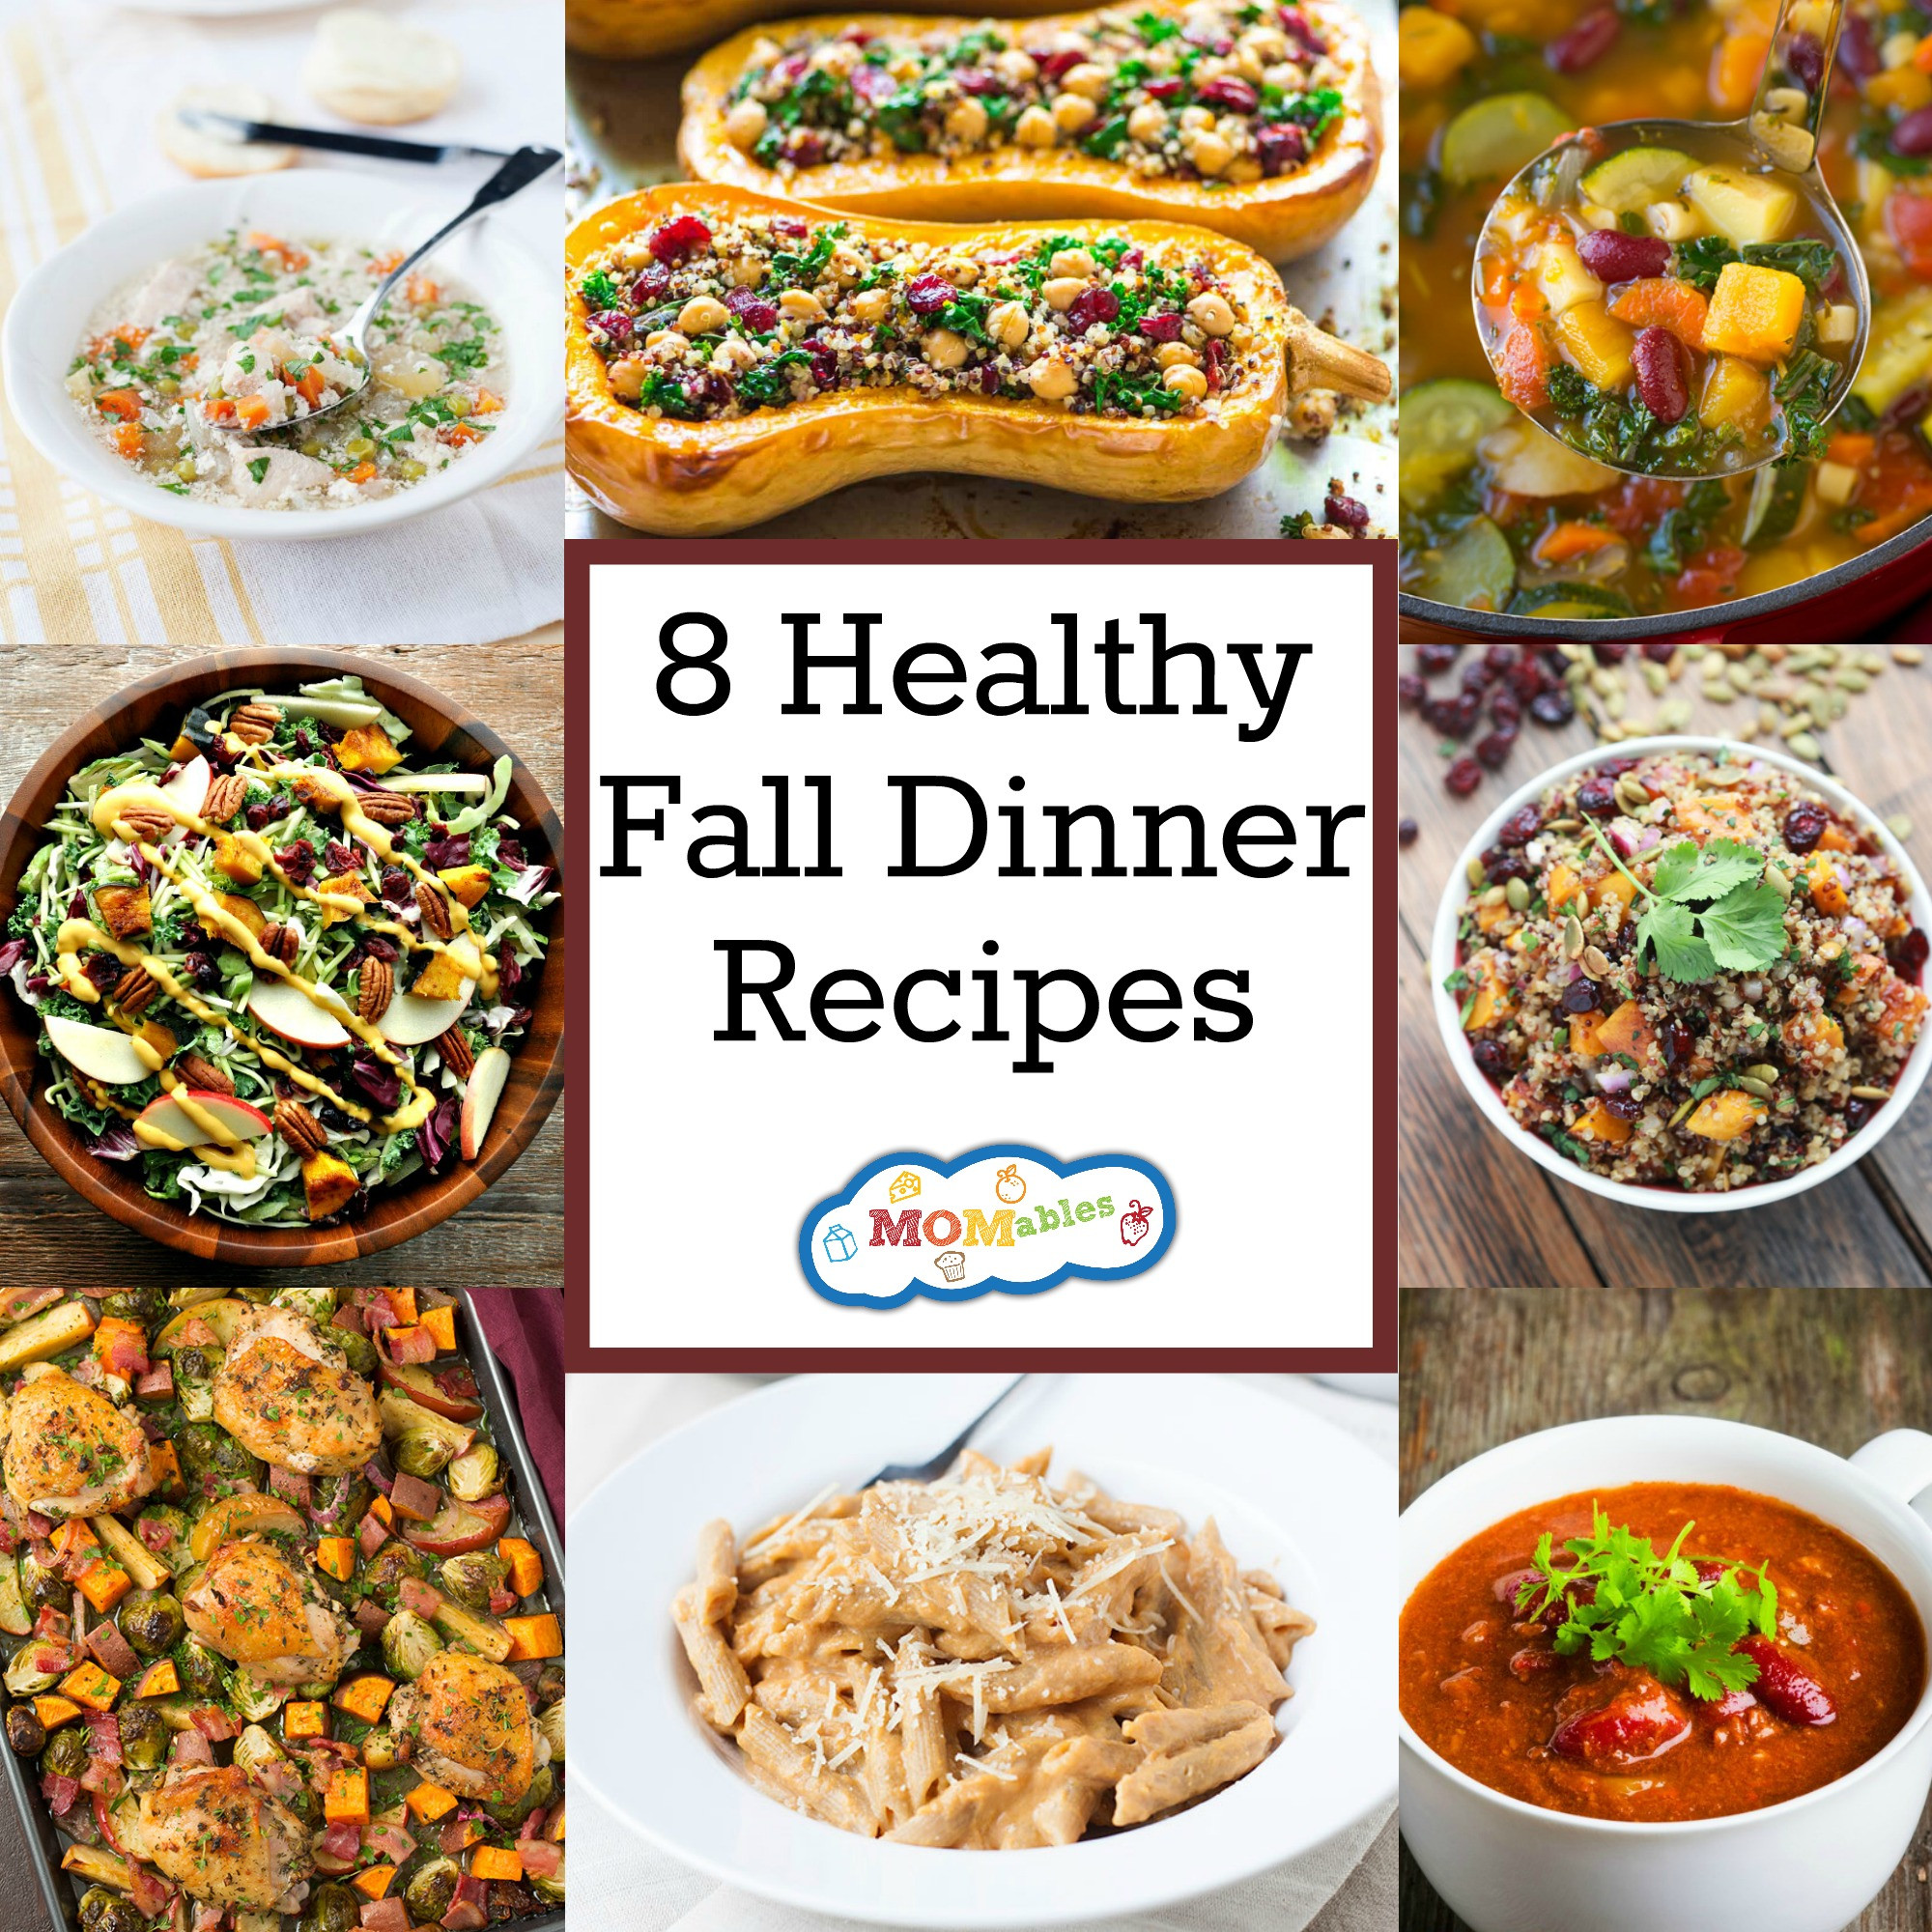 Healthy Sunday Dinner Ideas  8 Healthy Fall Dinner Recipes MOMables Good Food